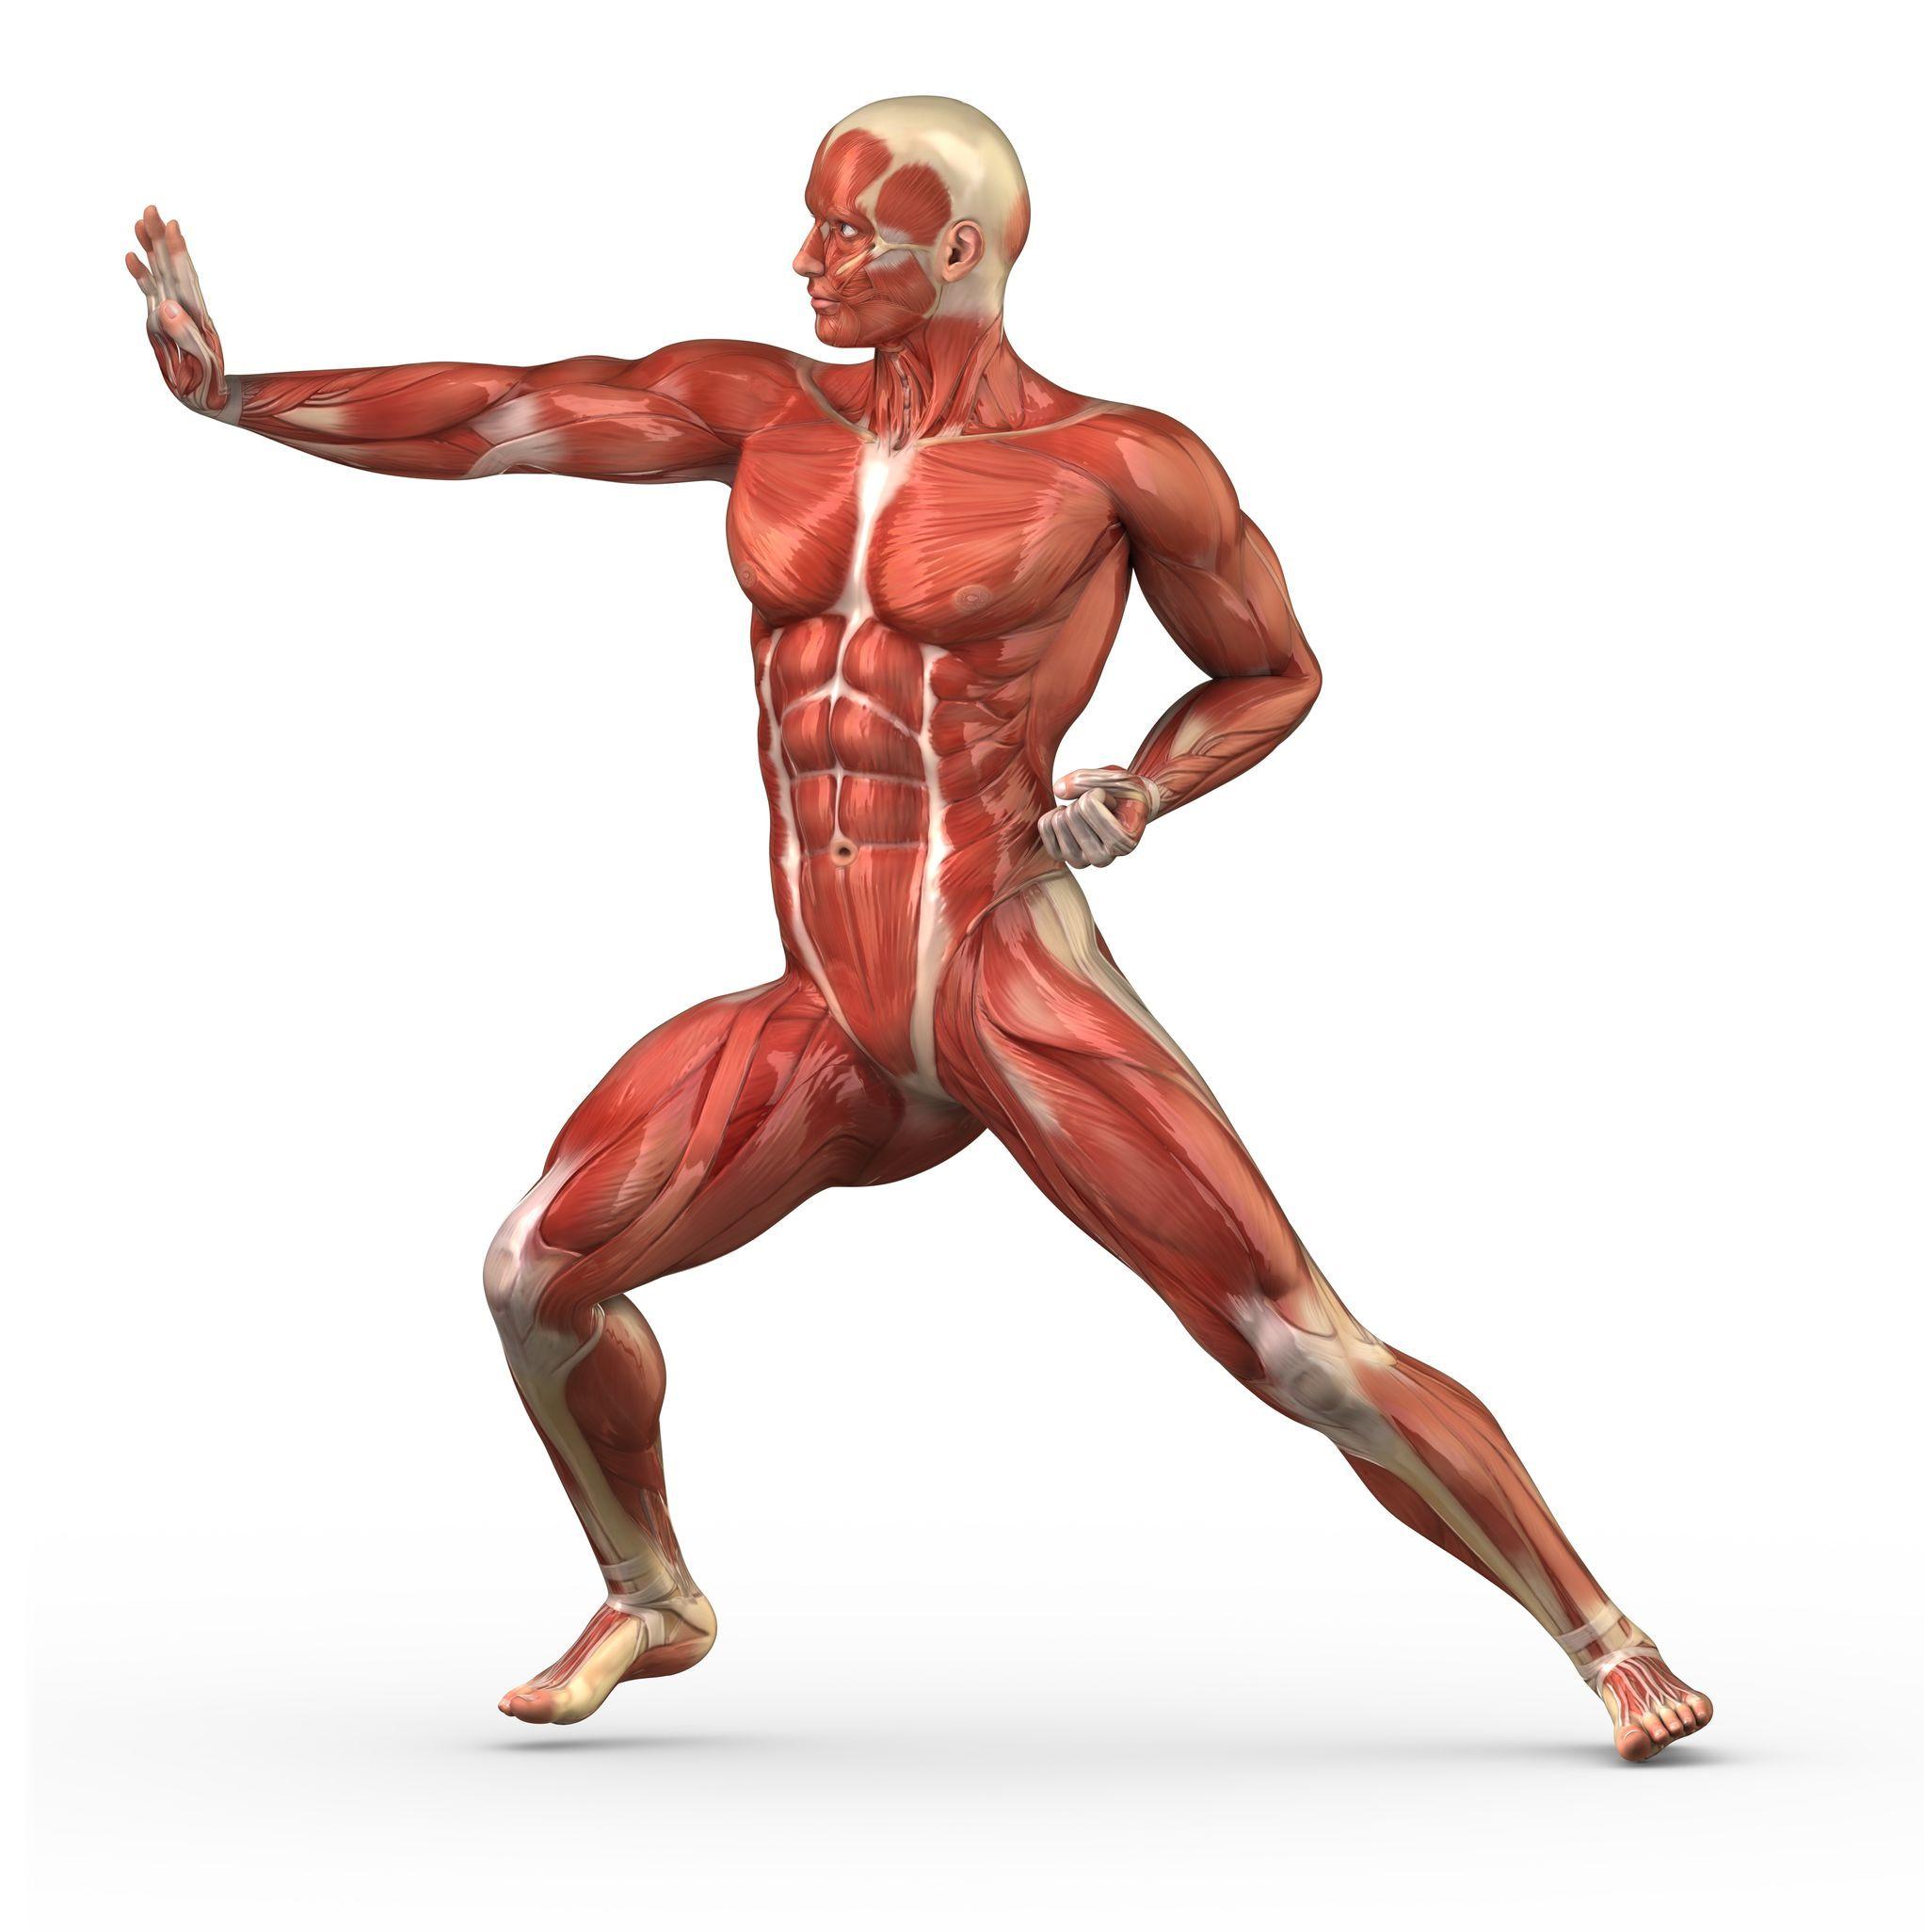 muscle anatomy | muscles anatomy body | Muscle Anatomy | Pinterest ...